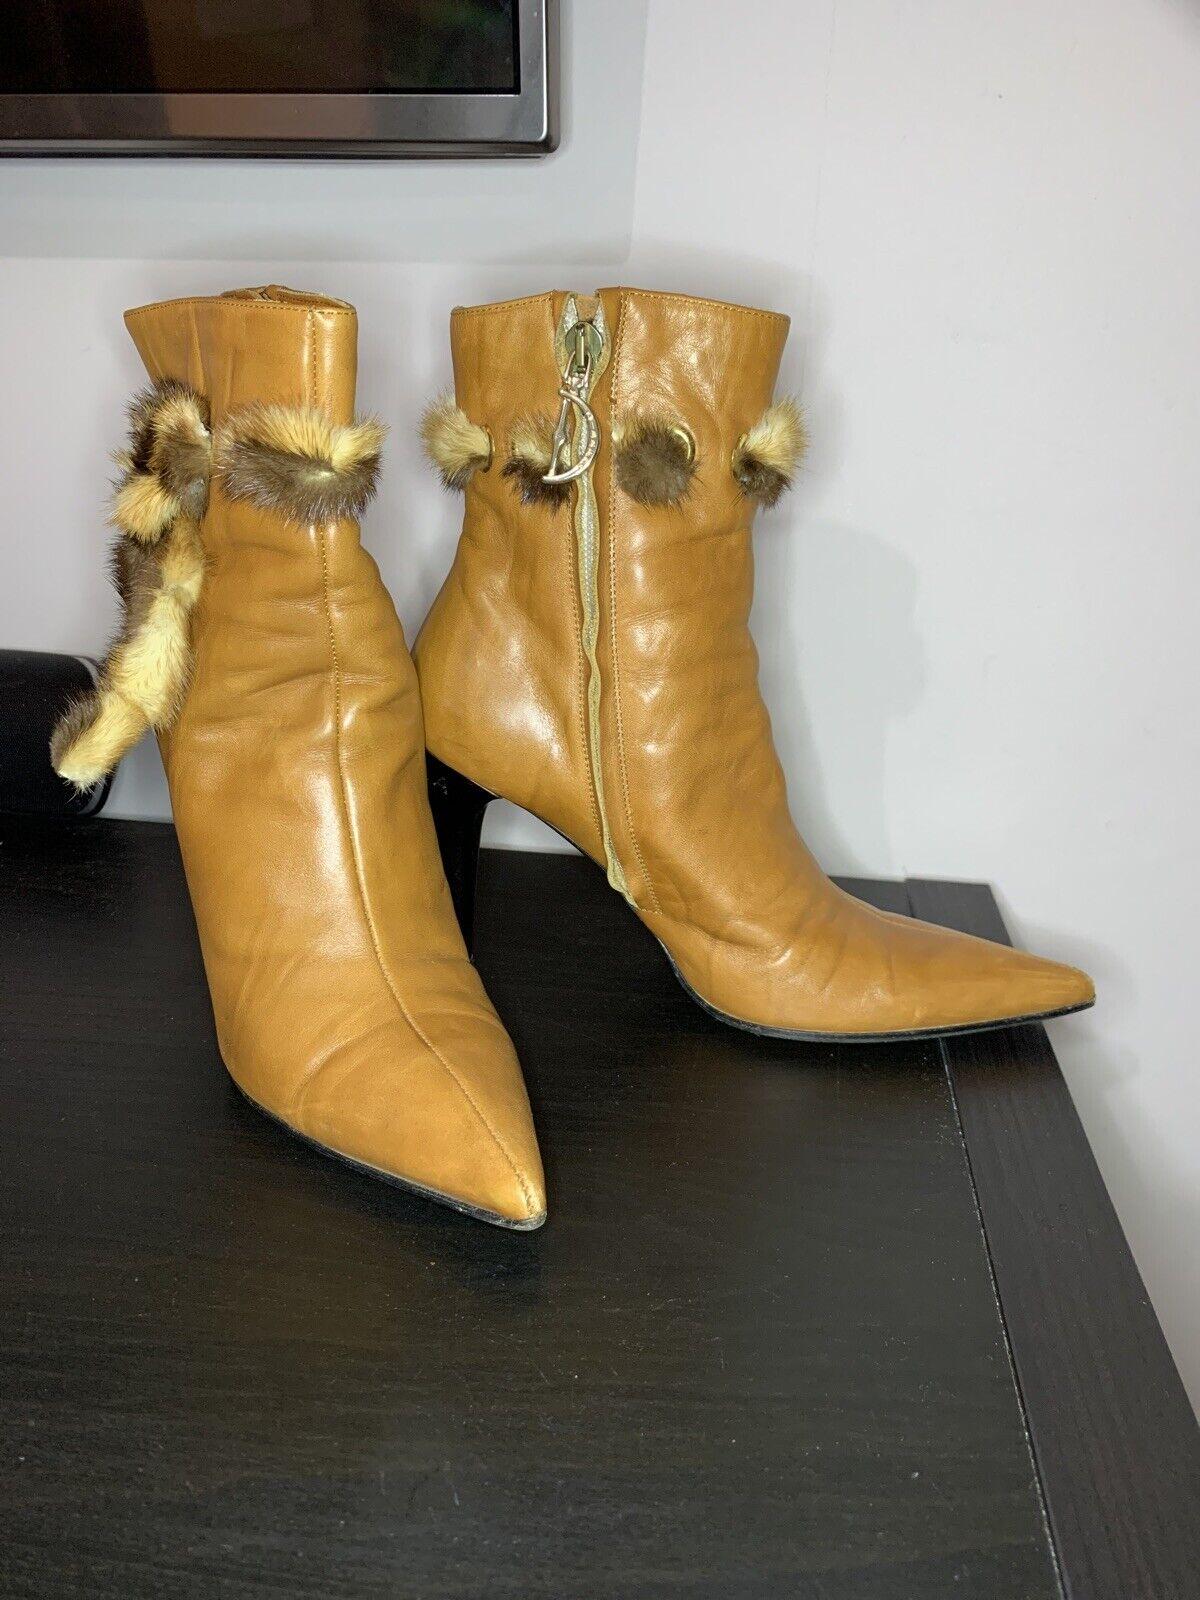 Dibrera By Paolo Zanoli Tan Leather High Heel Boots Uk 3 Eu 36 Made In Italy